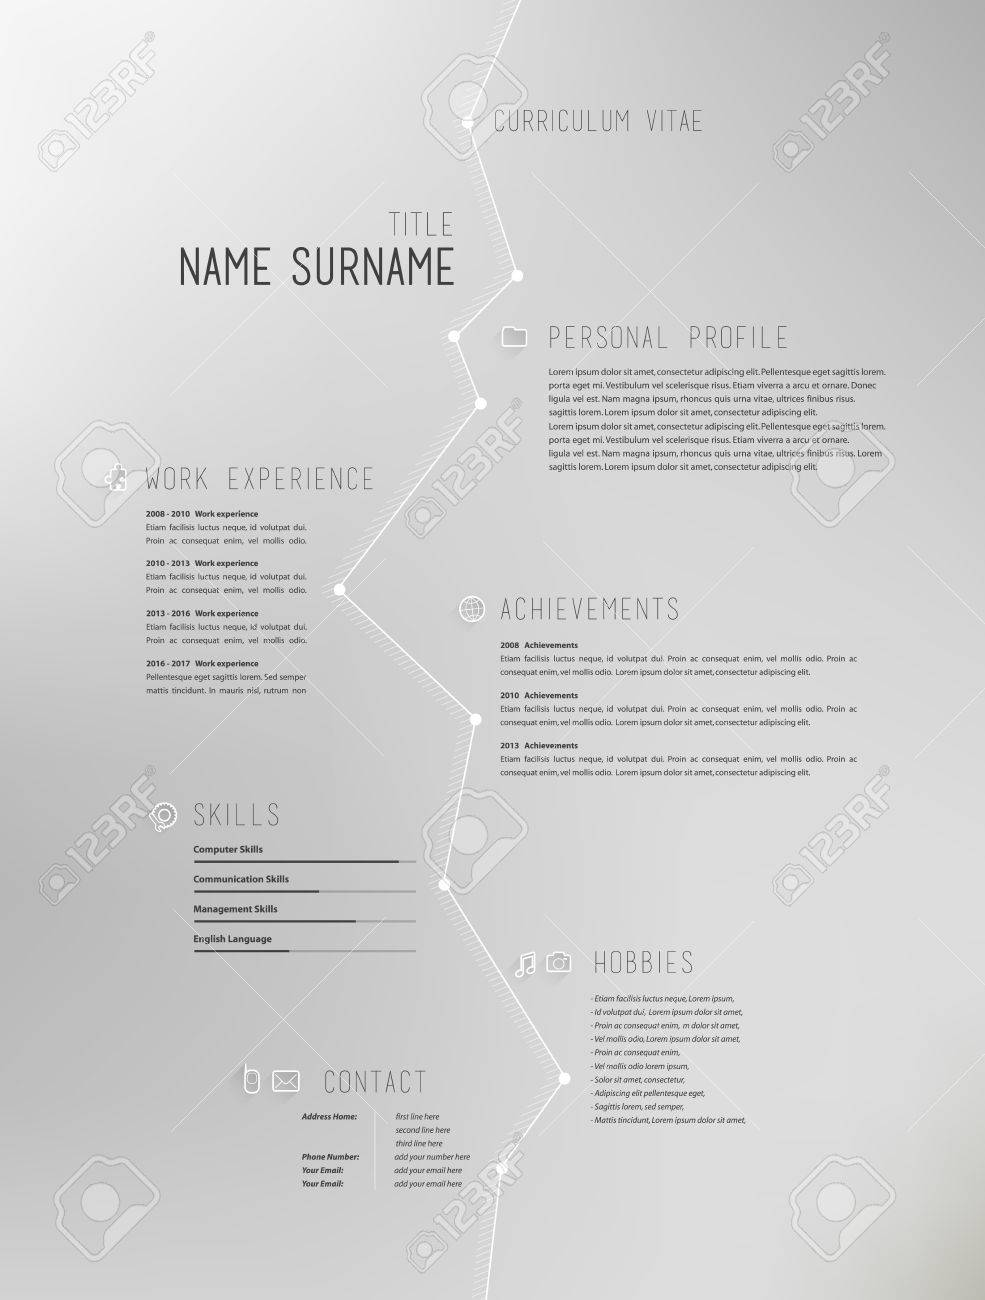 creative simple curriculum vitae template on grey background